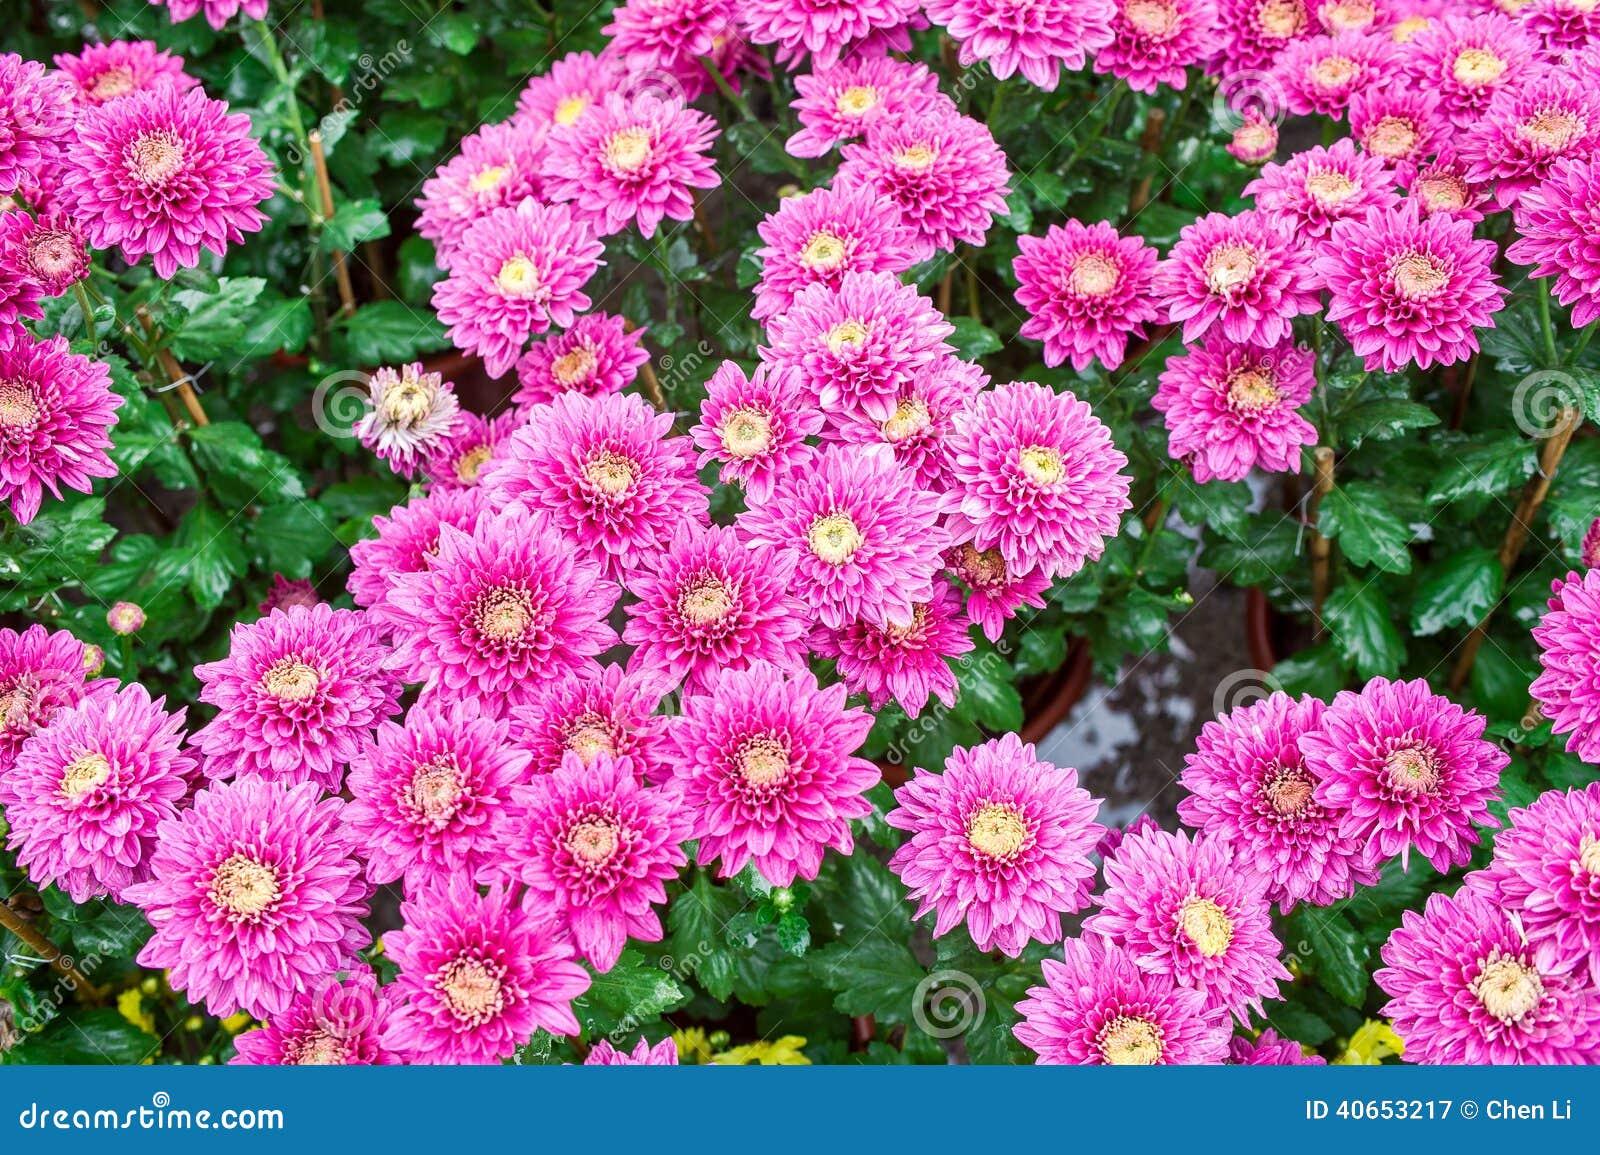 Chrysanthemum Stock Photo Image 40653217